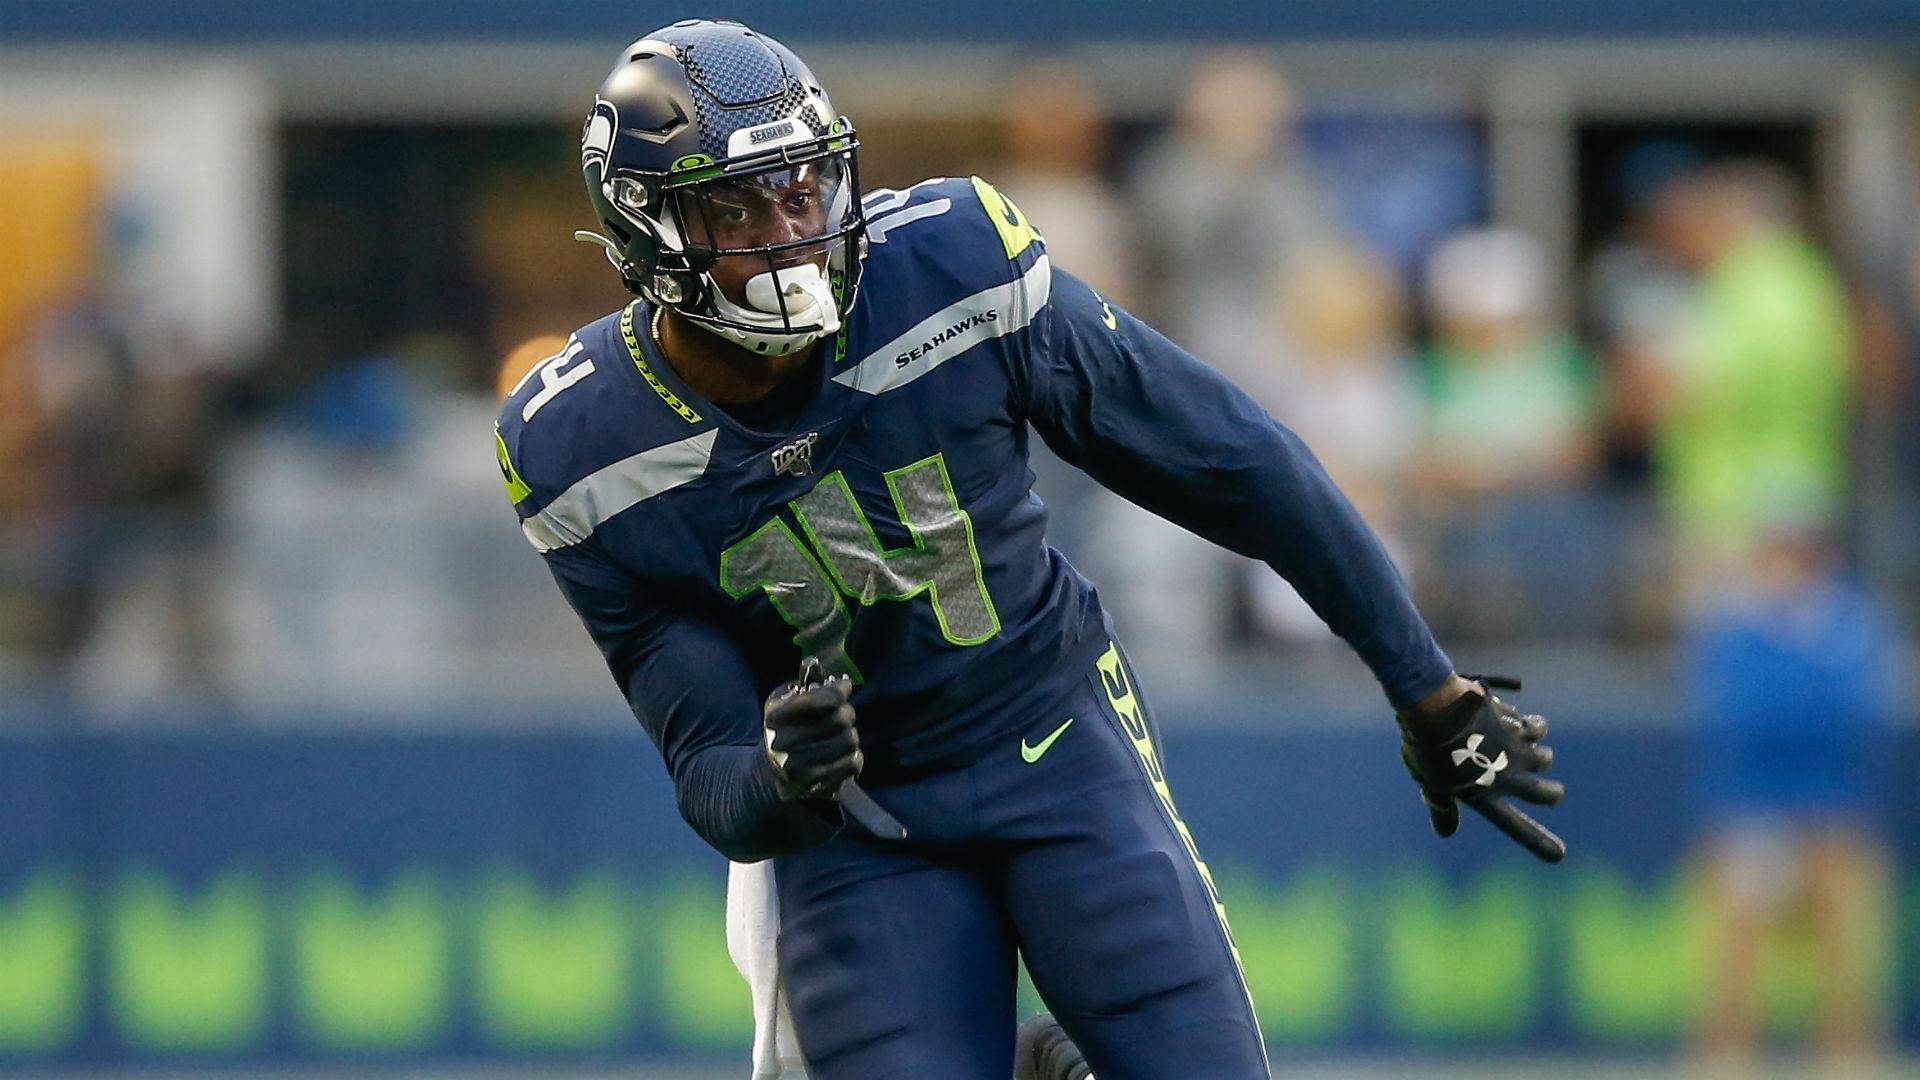 DK Metcalf injury update: Seahawks haven't ruled out rookie (knee) playing in Week 1, Pete Carroll says